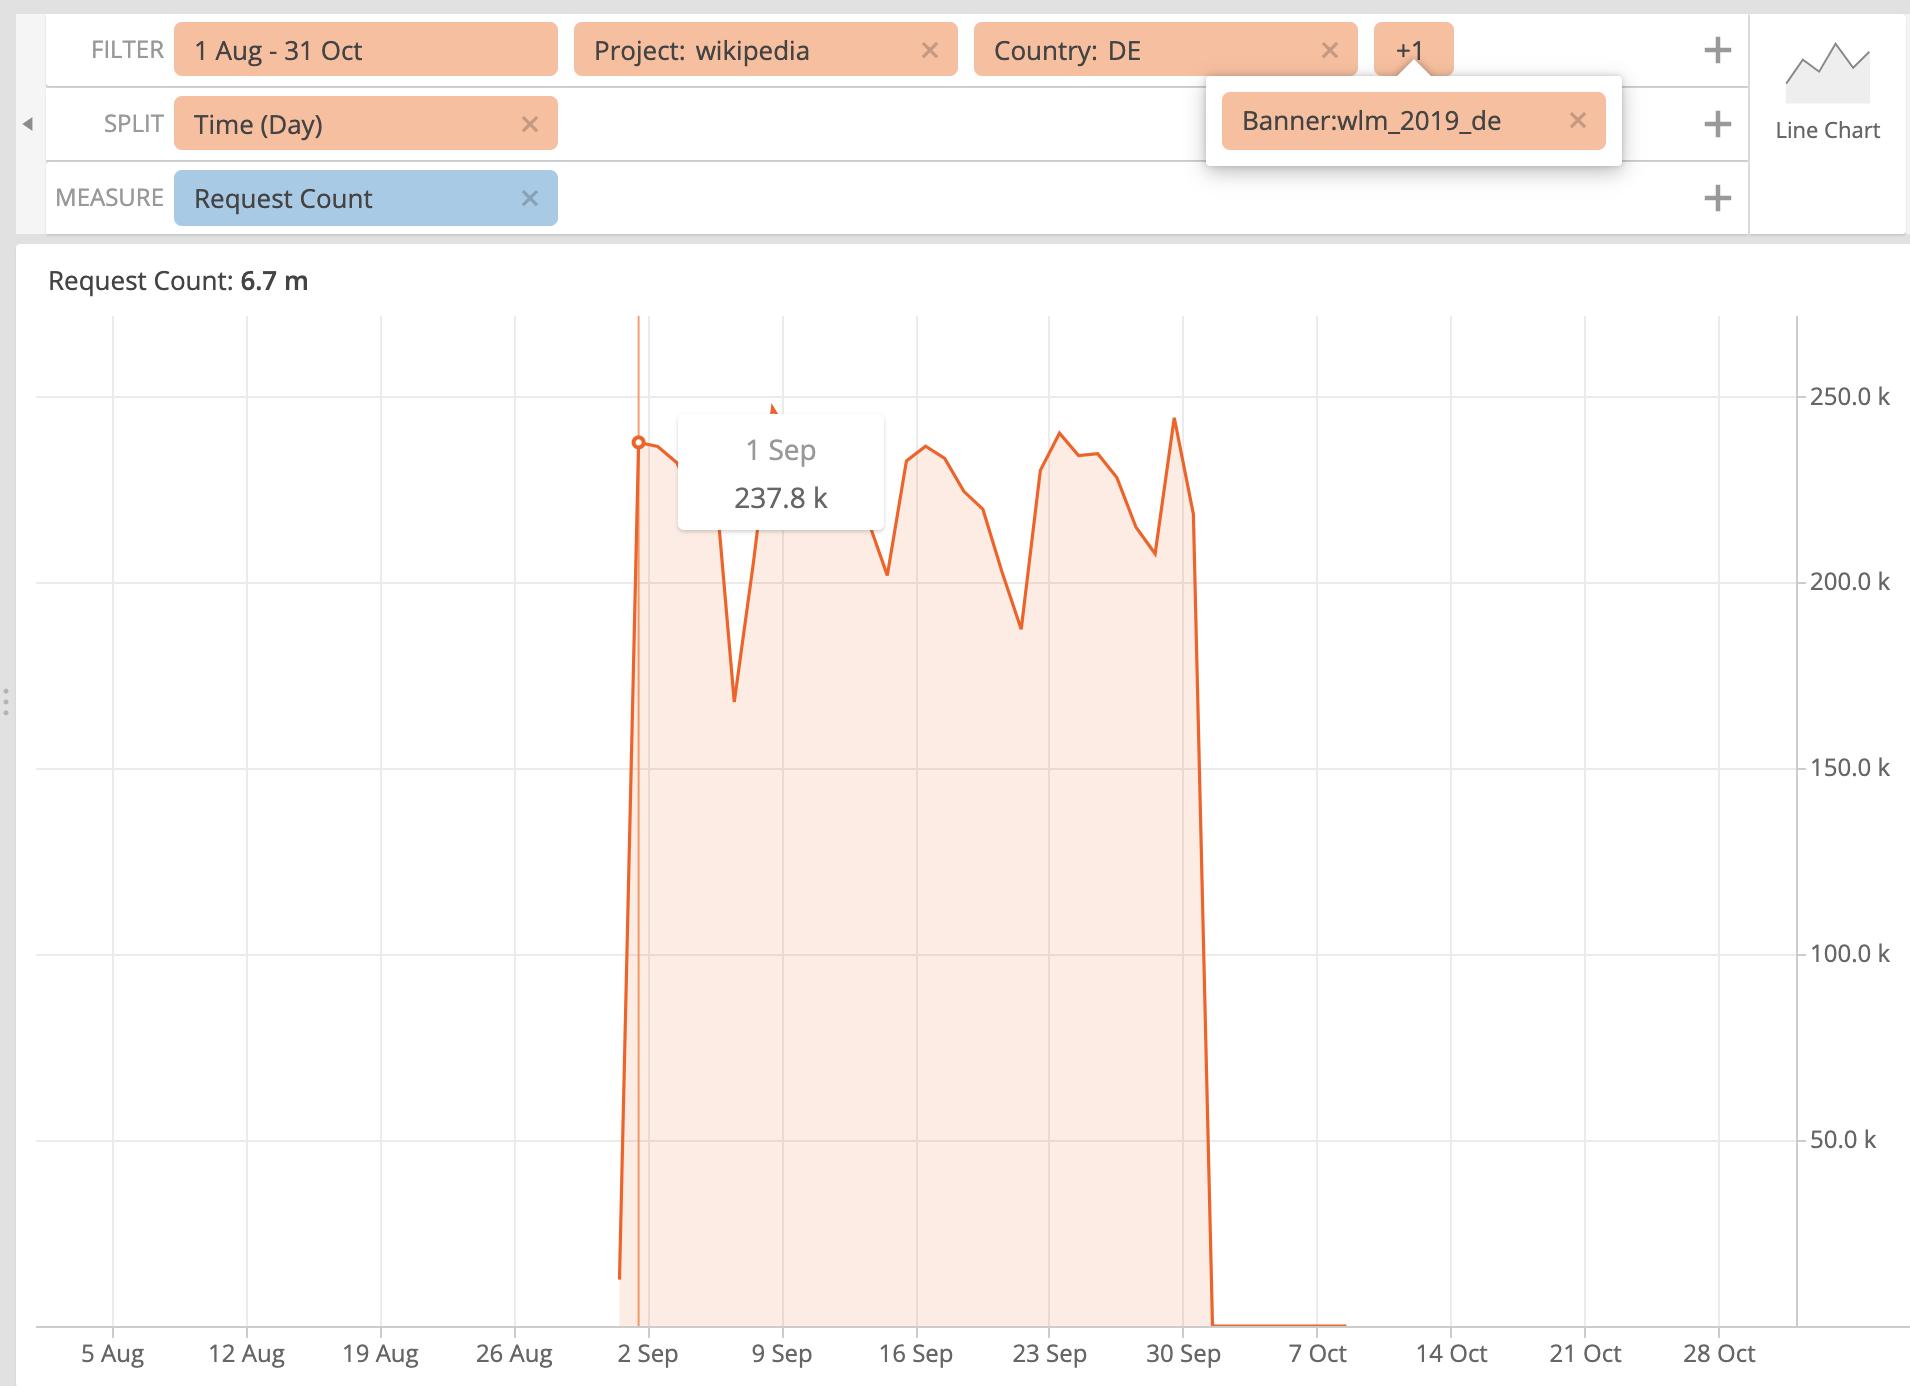 Screenshot 2019-12-06 at 11.53.18.png (1×1 px, 247 KB)